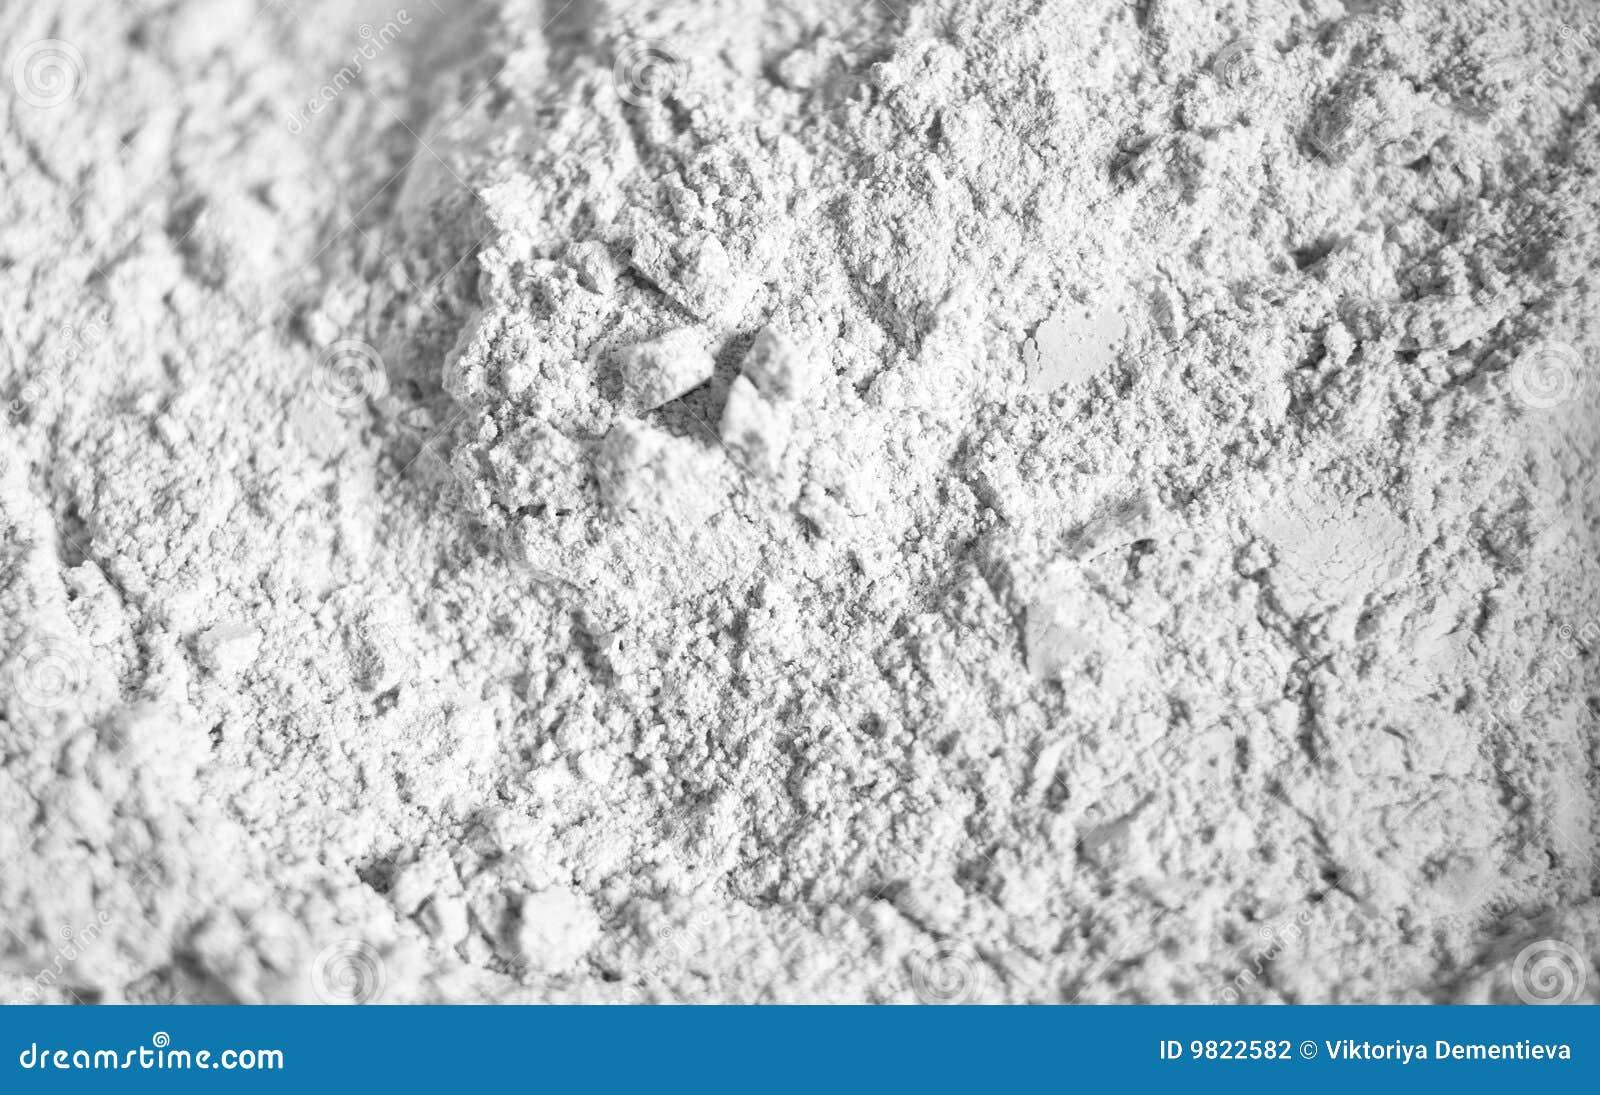 read Feasibility of amlodipine besylate, chloroquine phosphate, dapsone, phenytoin, pyridoxine hydrochloride, sulfadiazine, sulfasalazine, tetracycline hydrochloride,